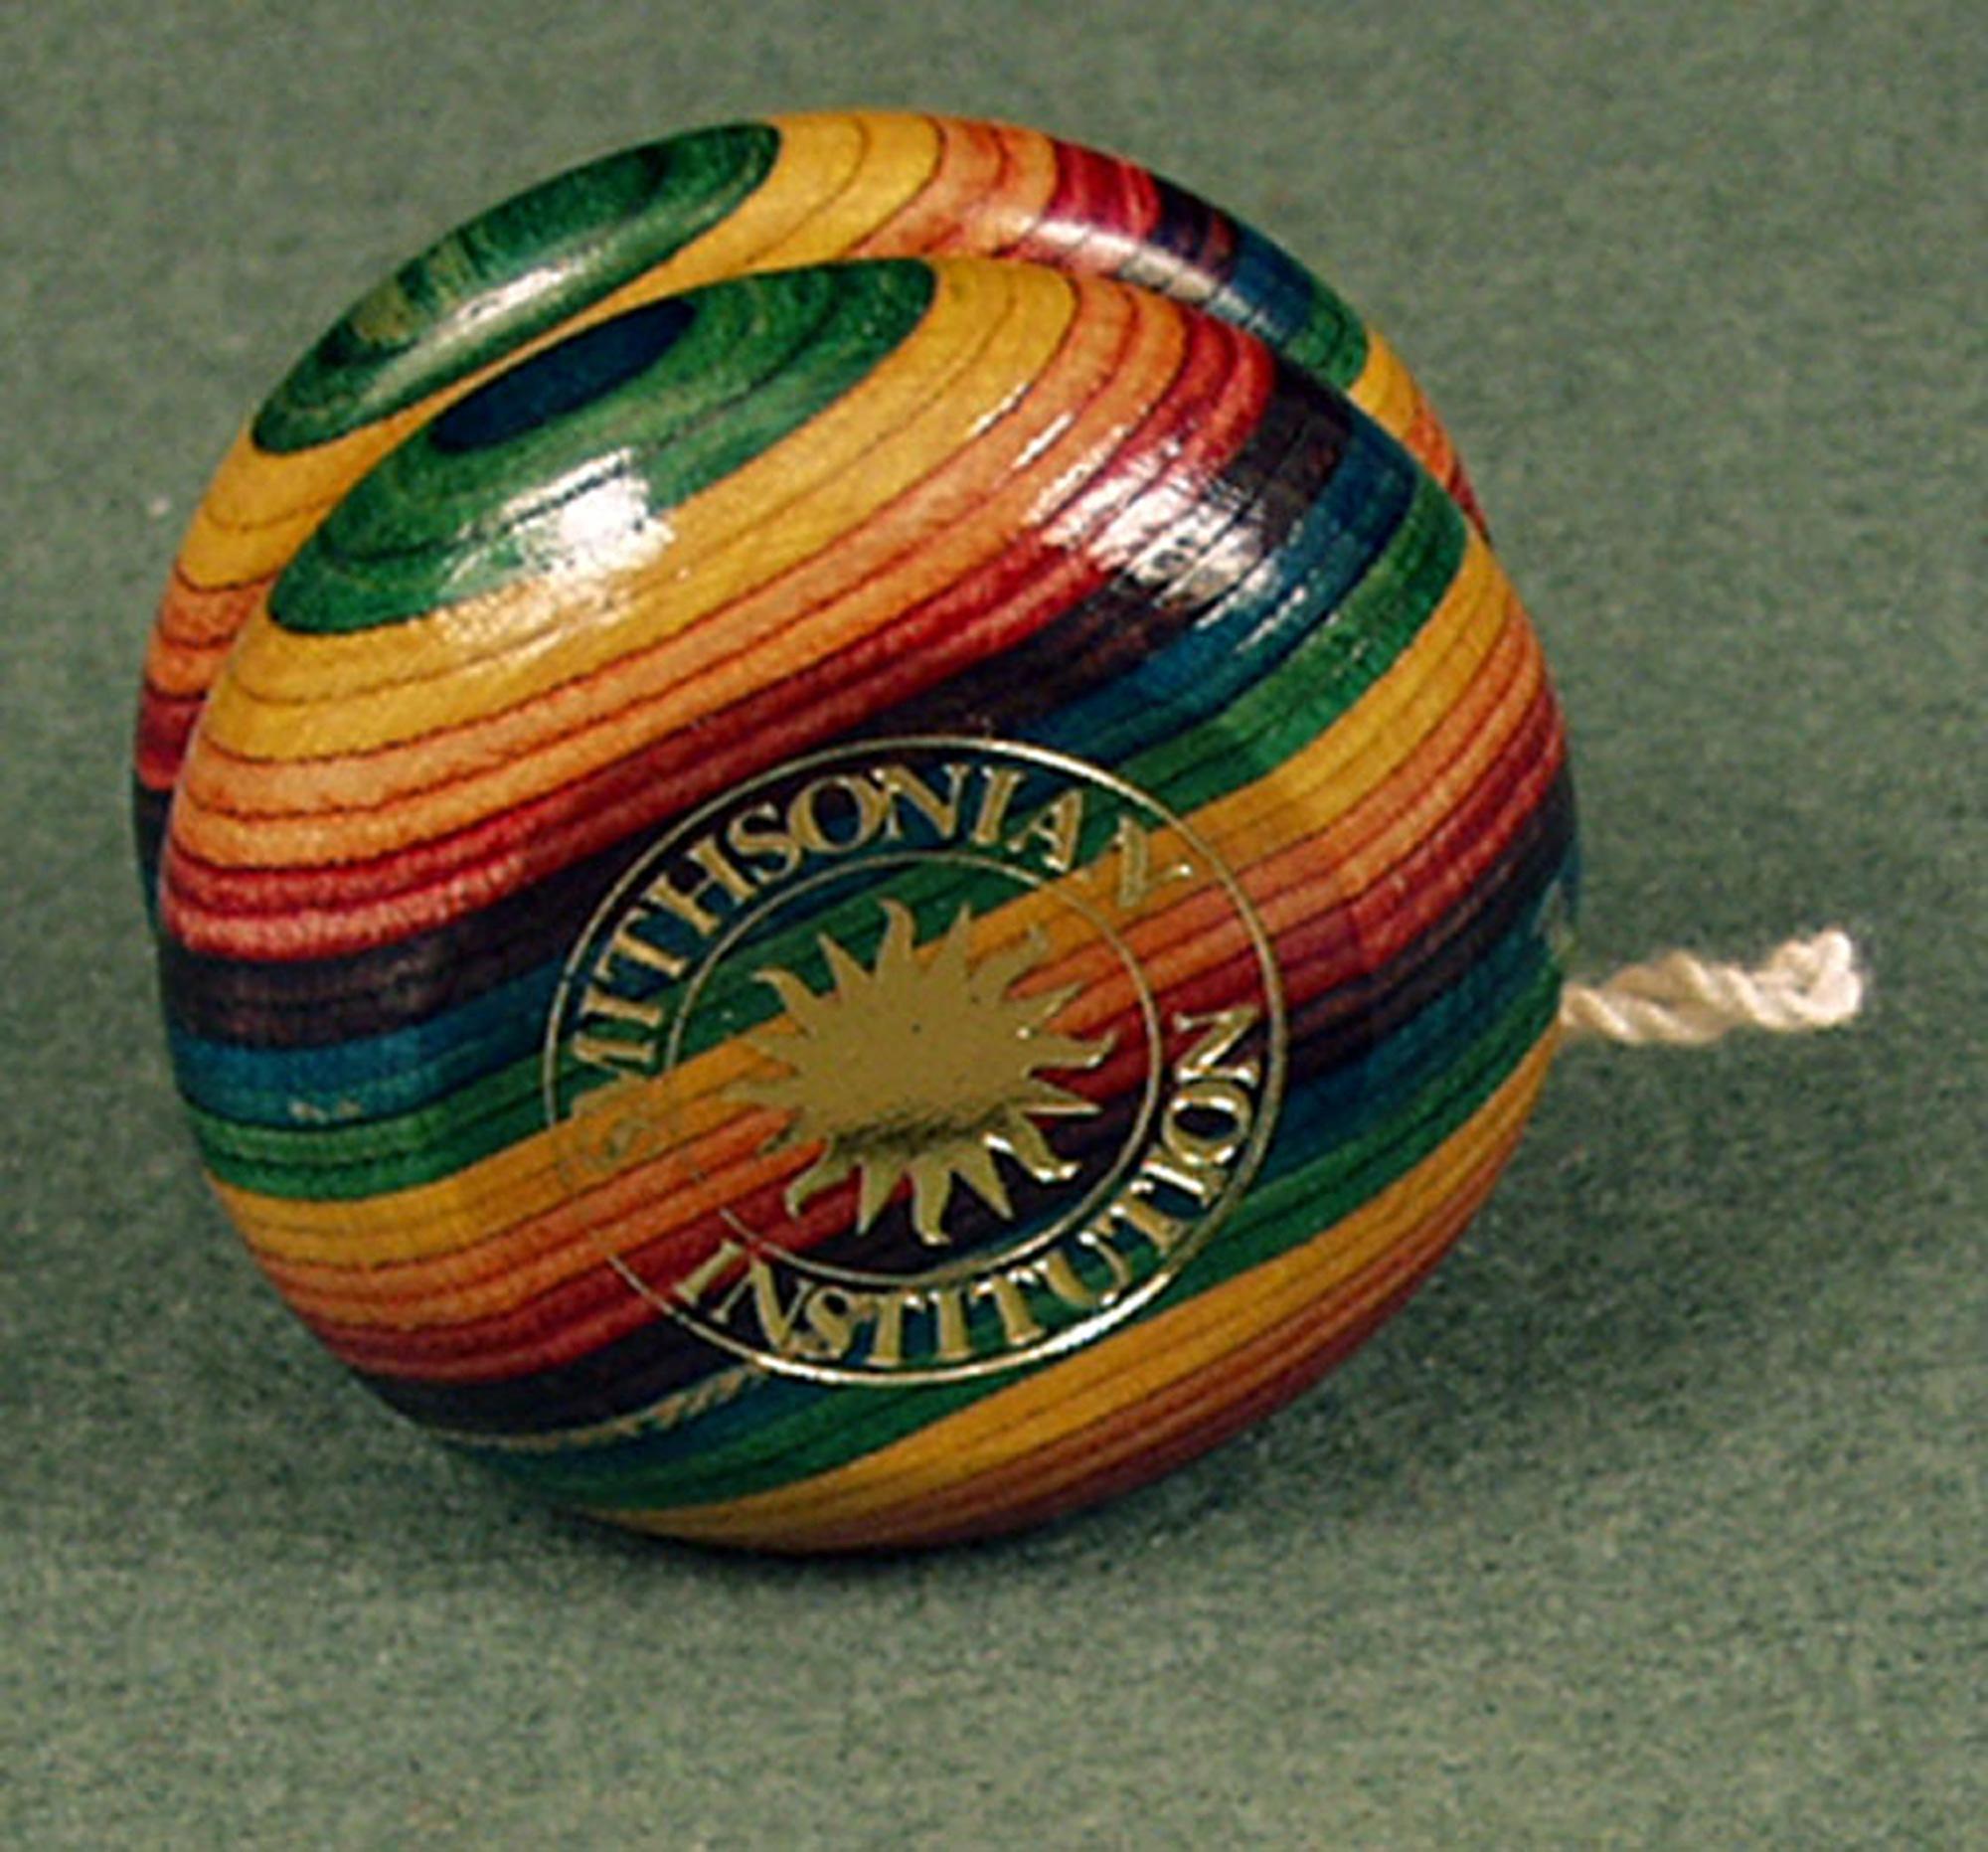 Wooden yo-yo with rainbow stripes and a golden Smithsonian logo